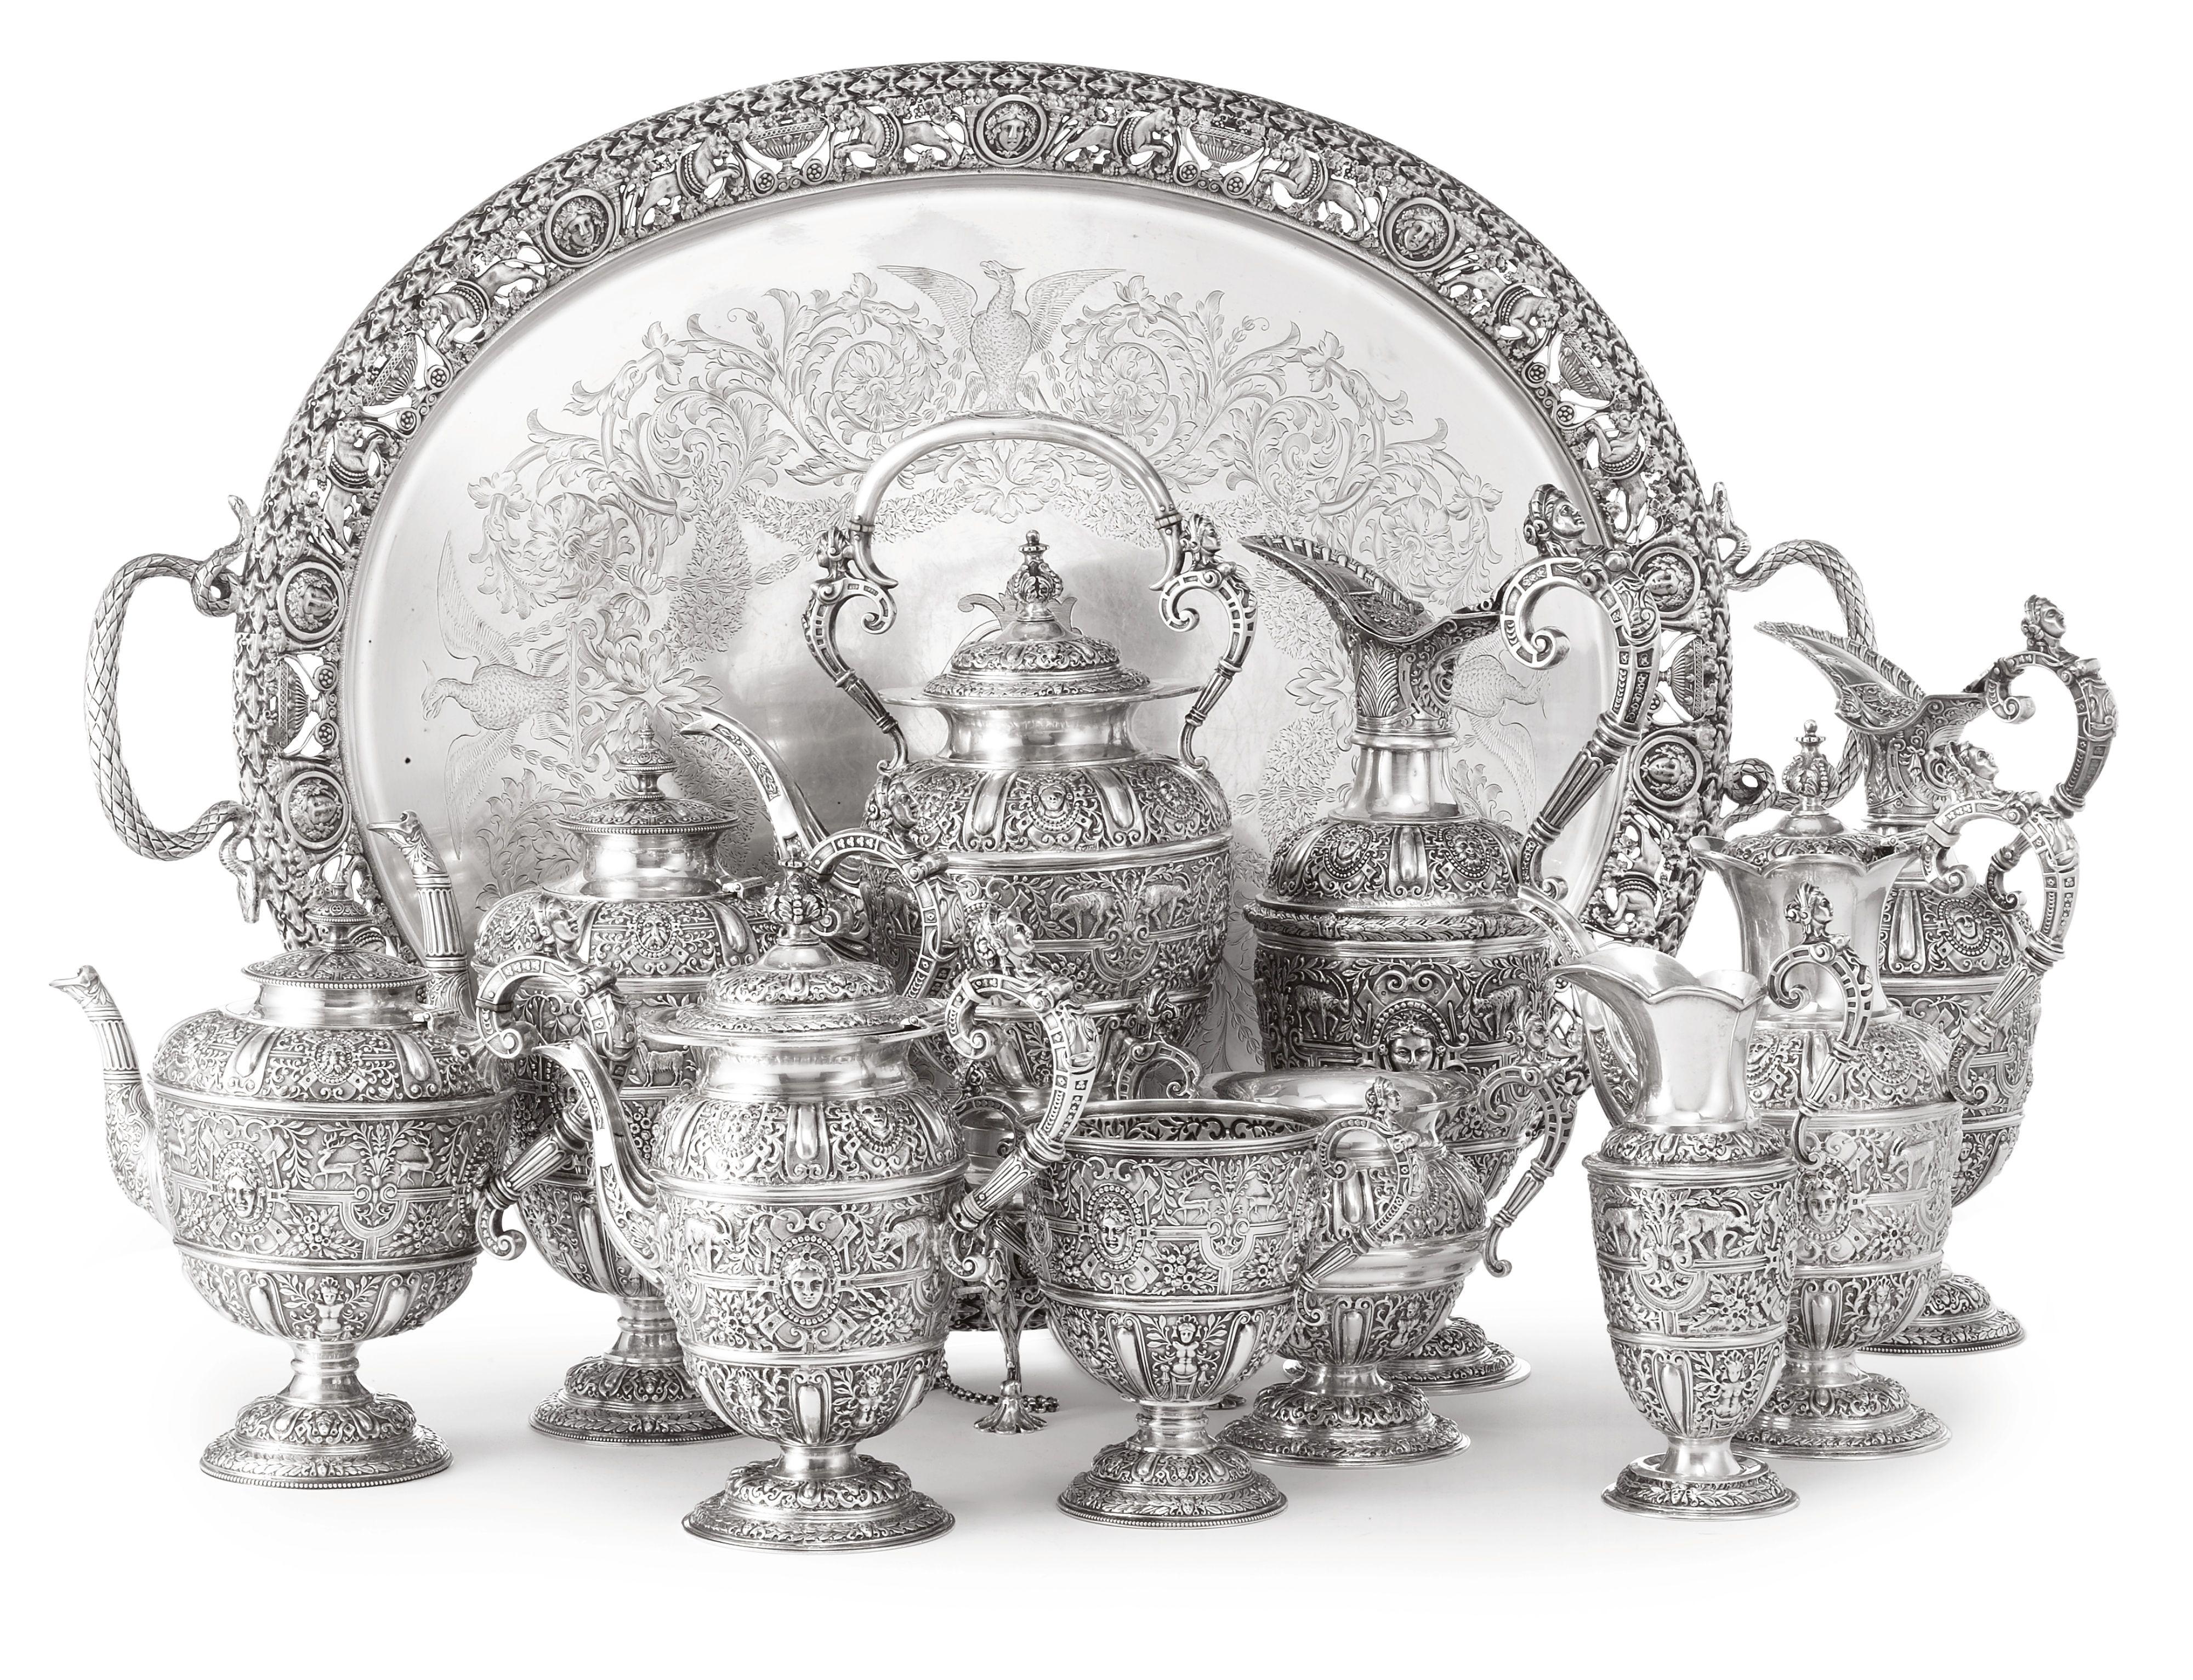 An Assembled Victorian and Edwardian Tenpiece Tea and